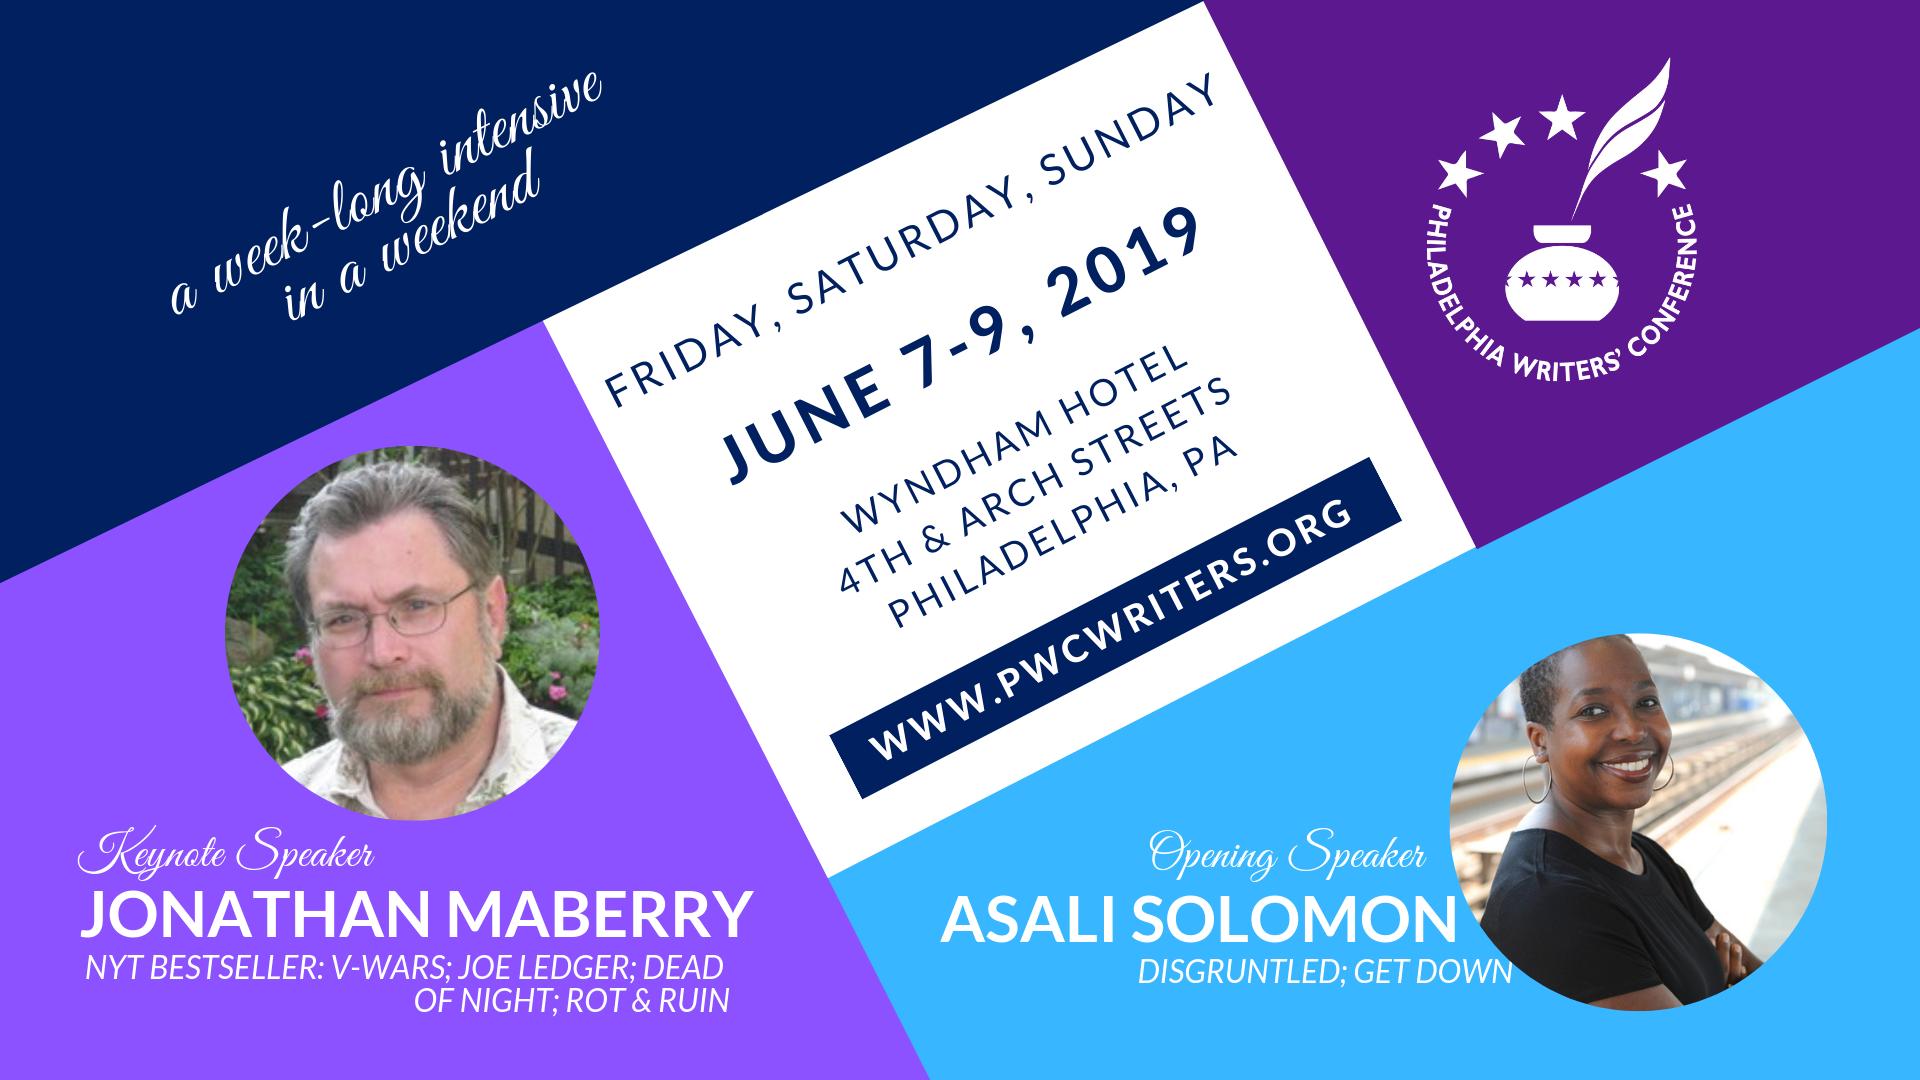 2019 Philadelphia Writers Conference